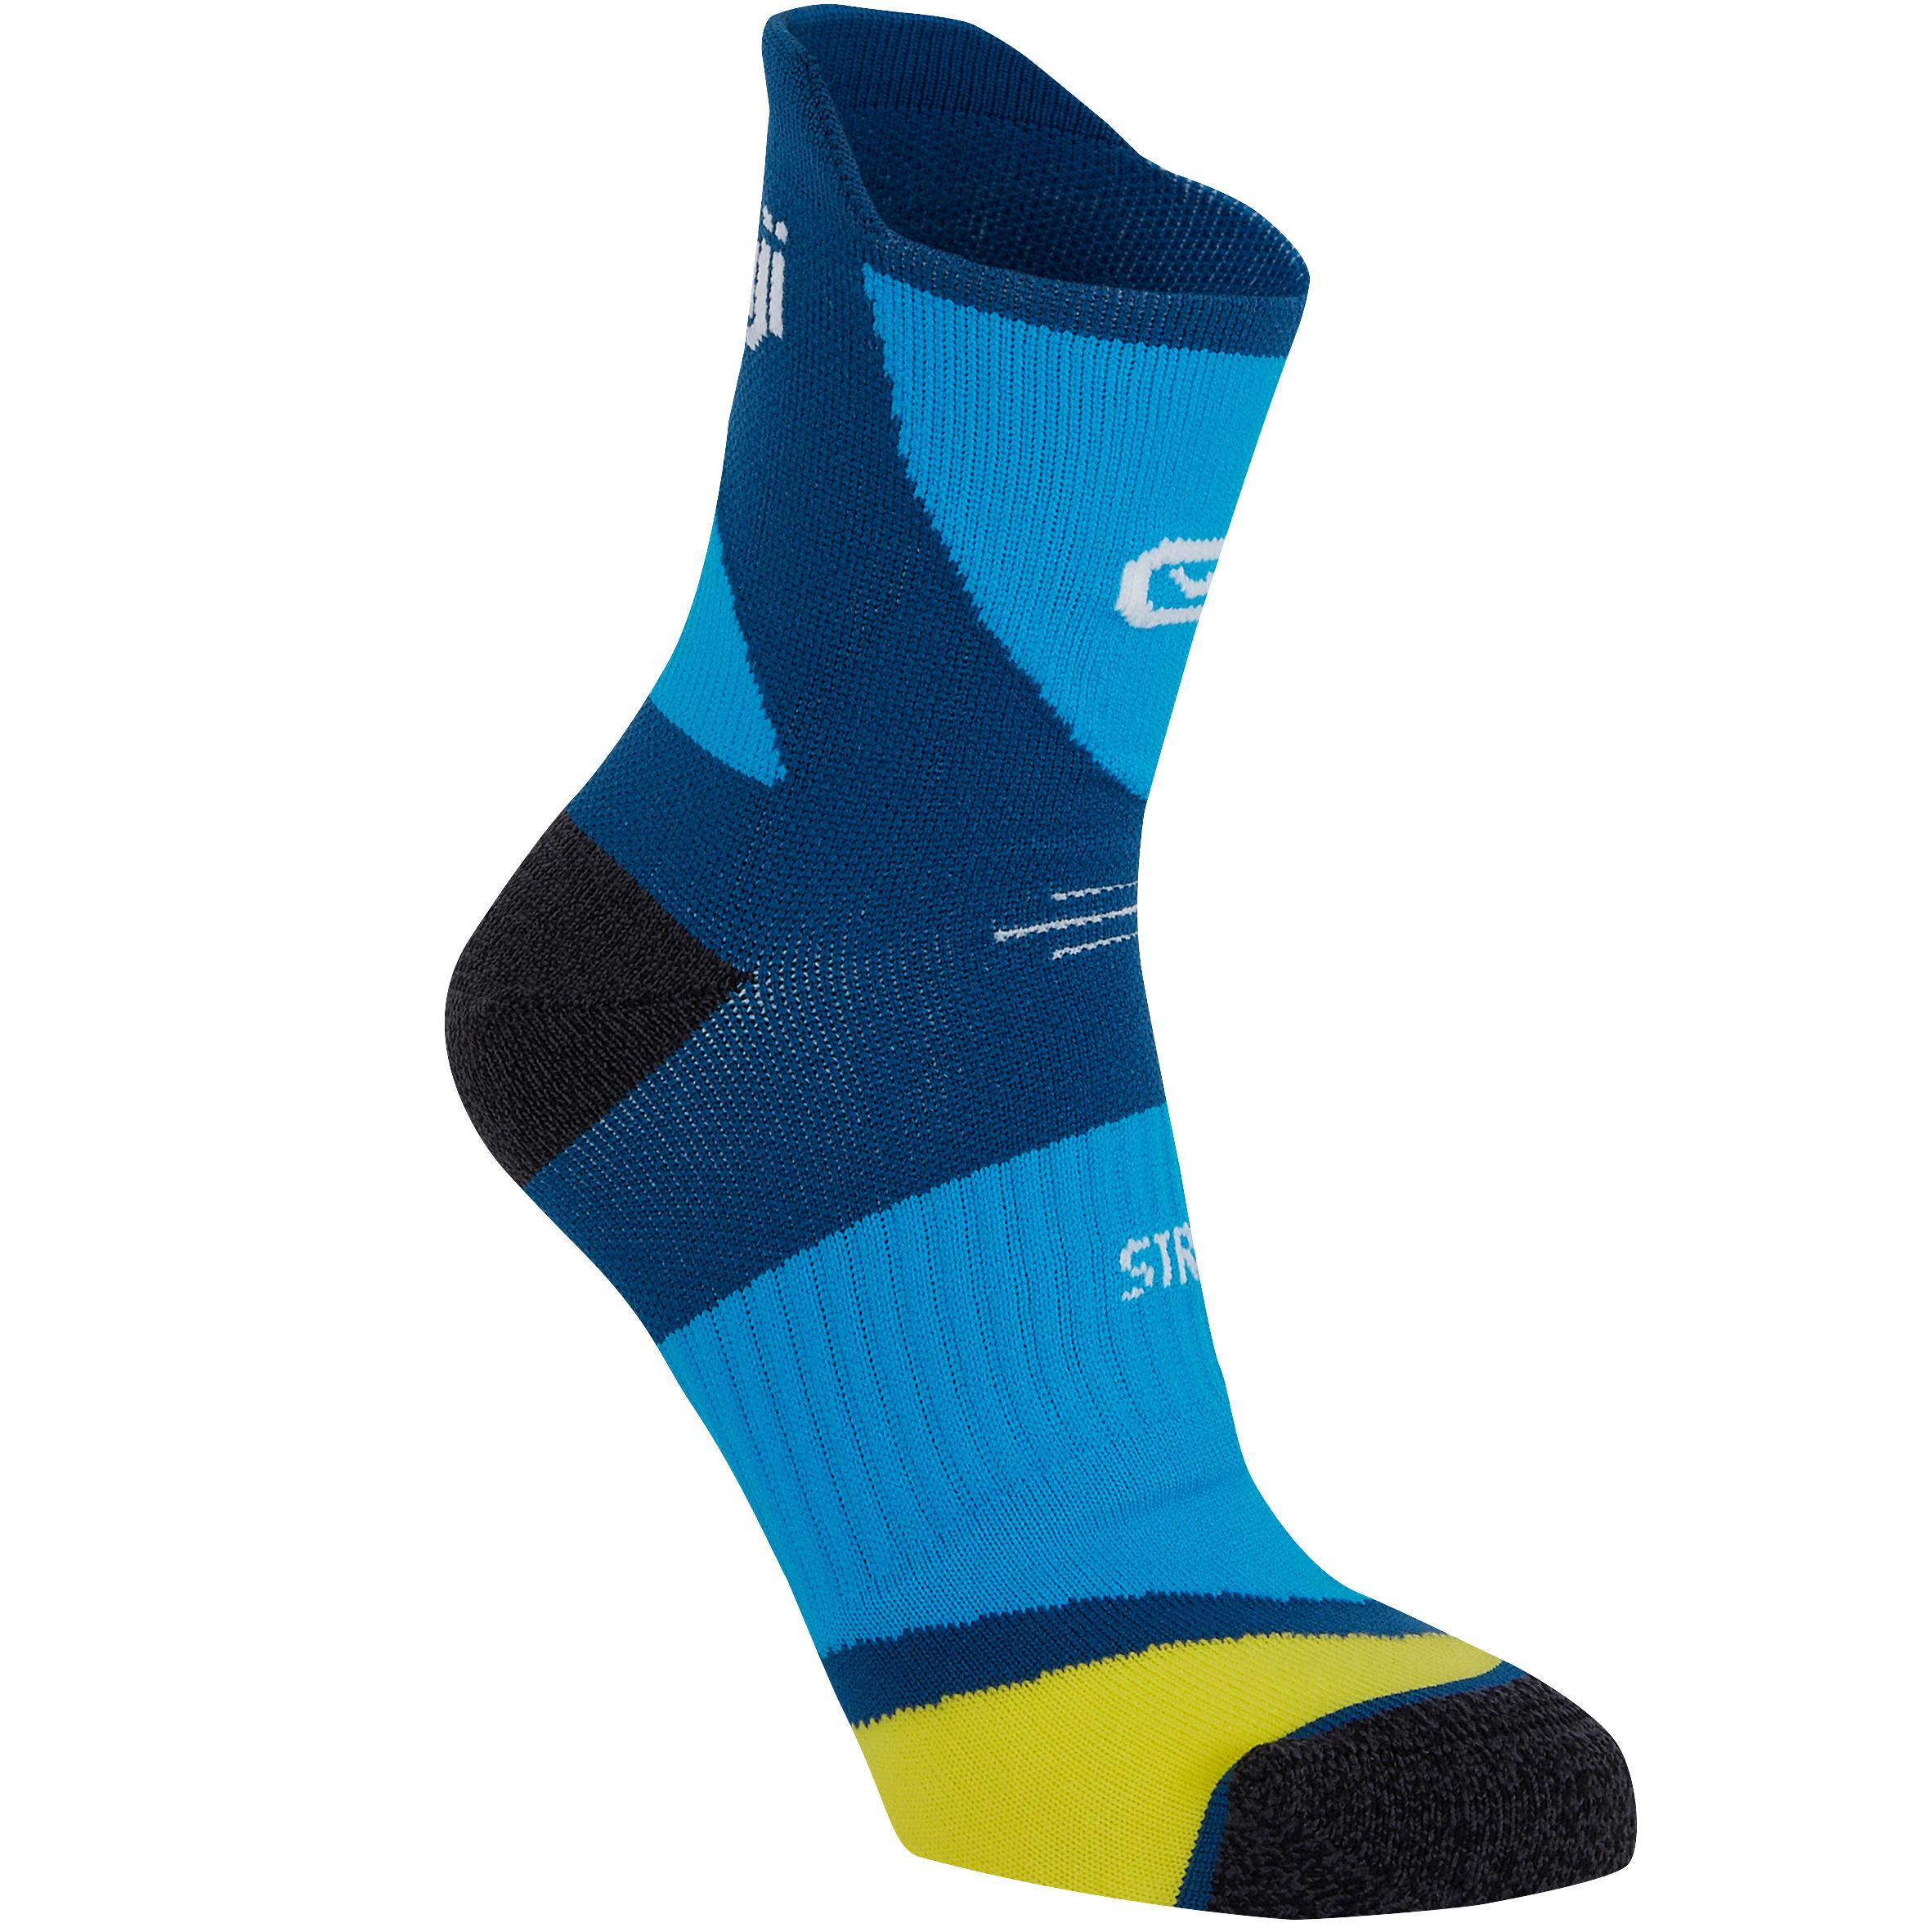 Laufsocken dick Kiprun Strap blau | Sportbekleidung > Funktionswäsche | Kalenji